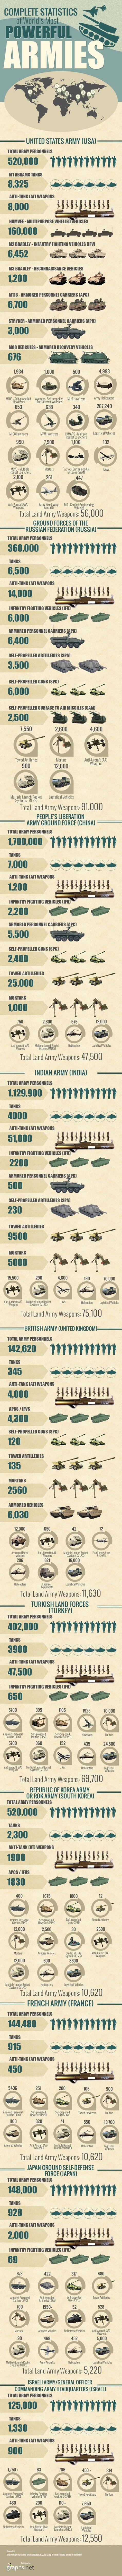 Statistics of World's Powerful Armies